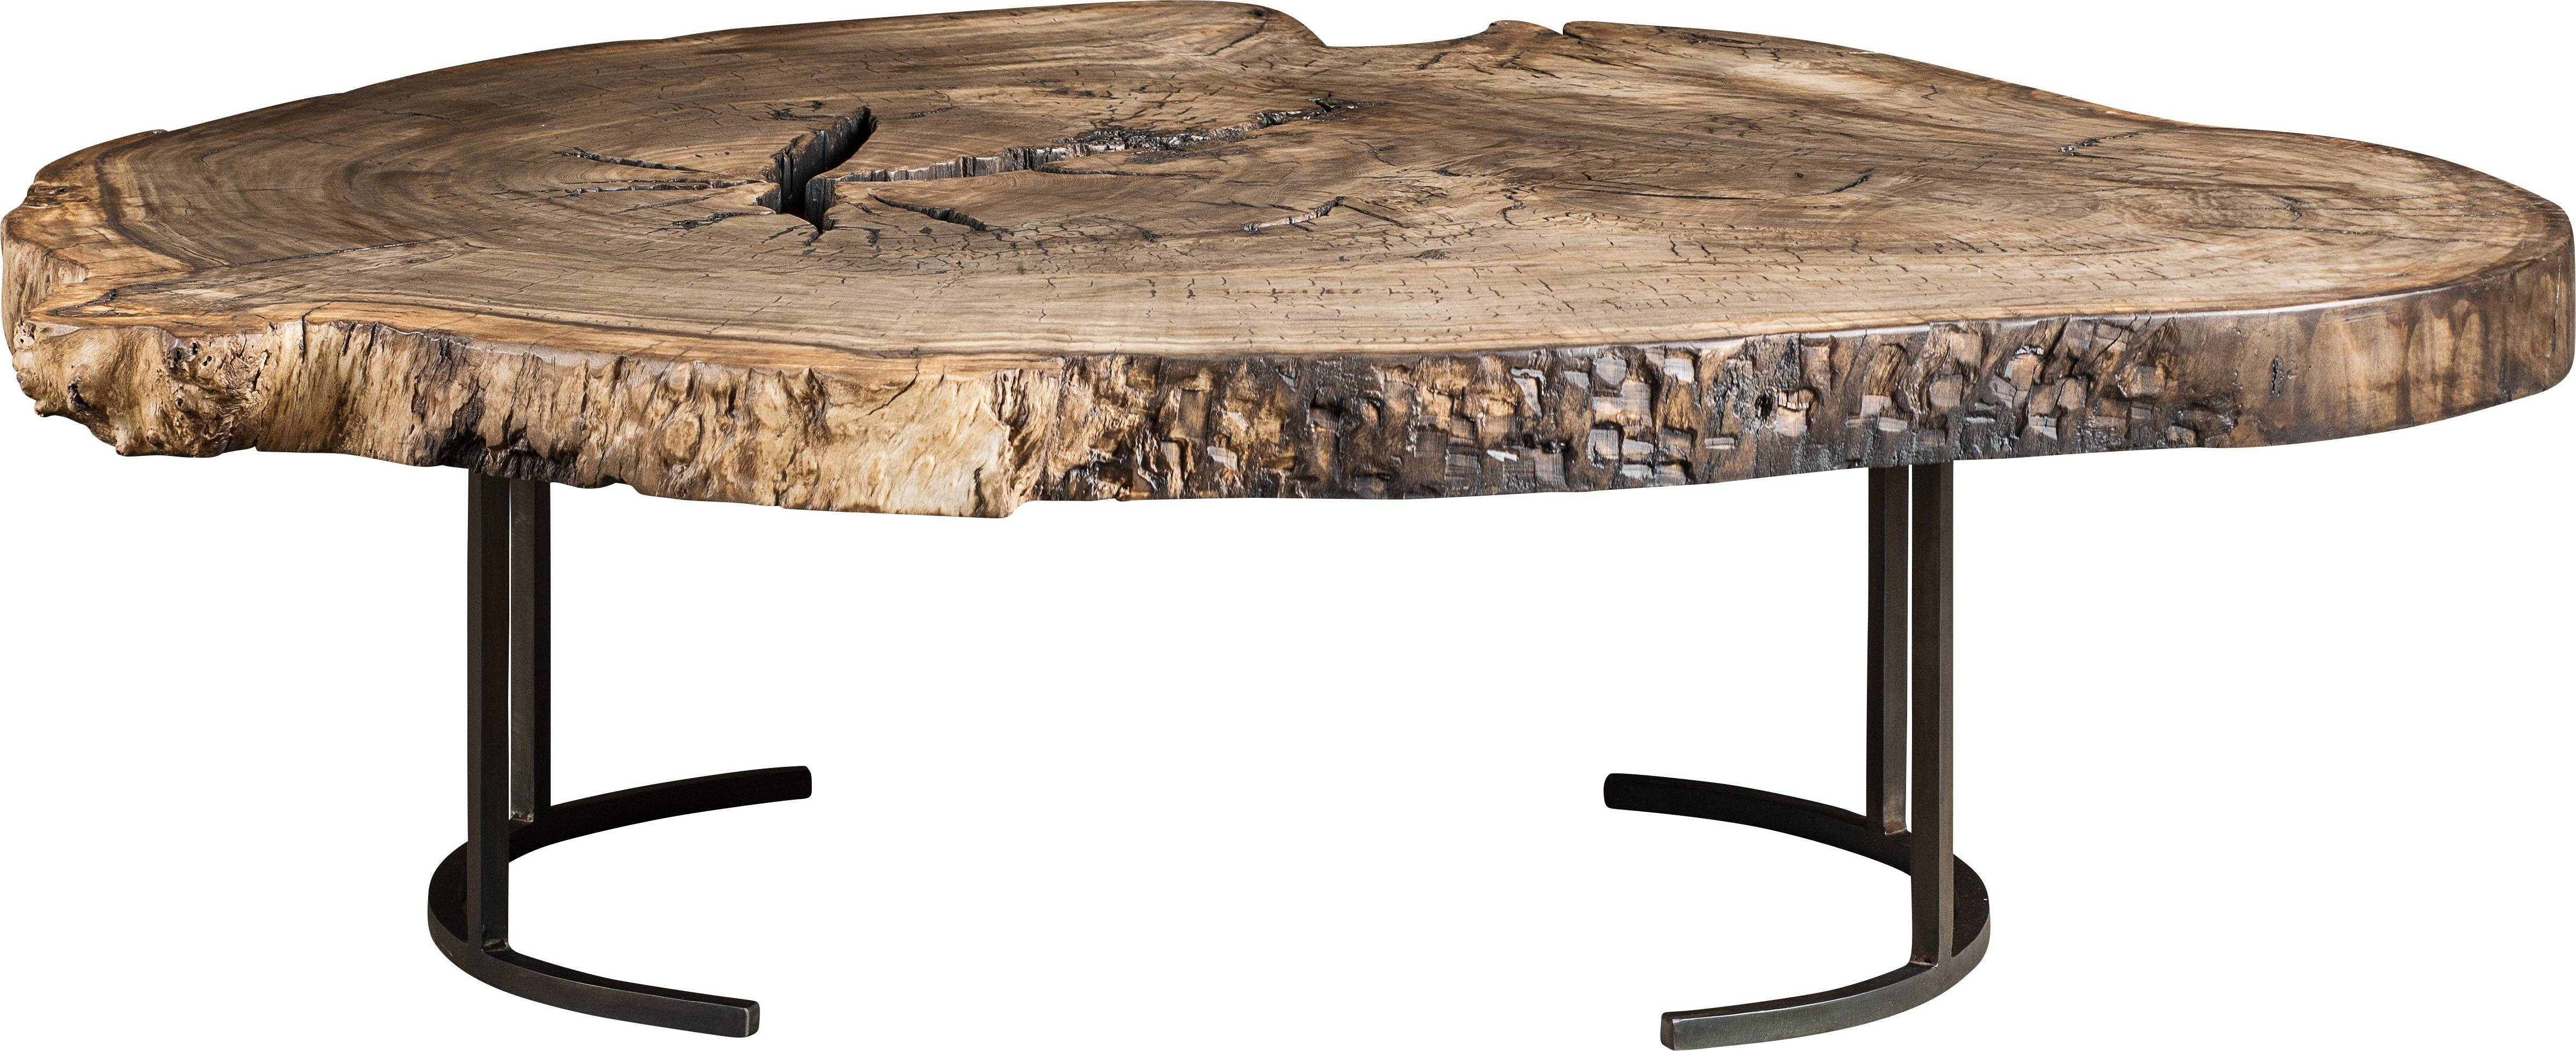 Luna Yukas Coffee Table – Taracea with regard to Luna Coffee Tables (Image 28 of 30)